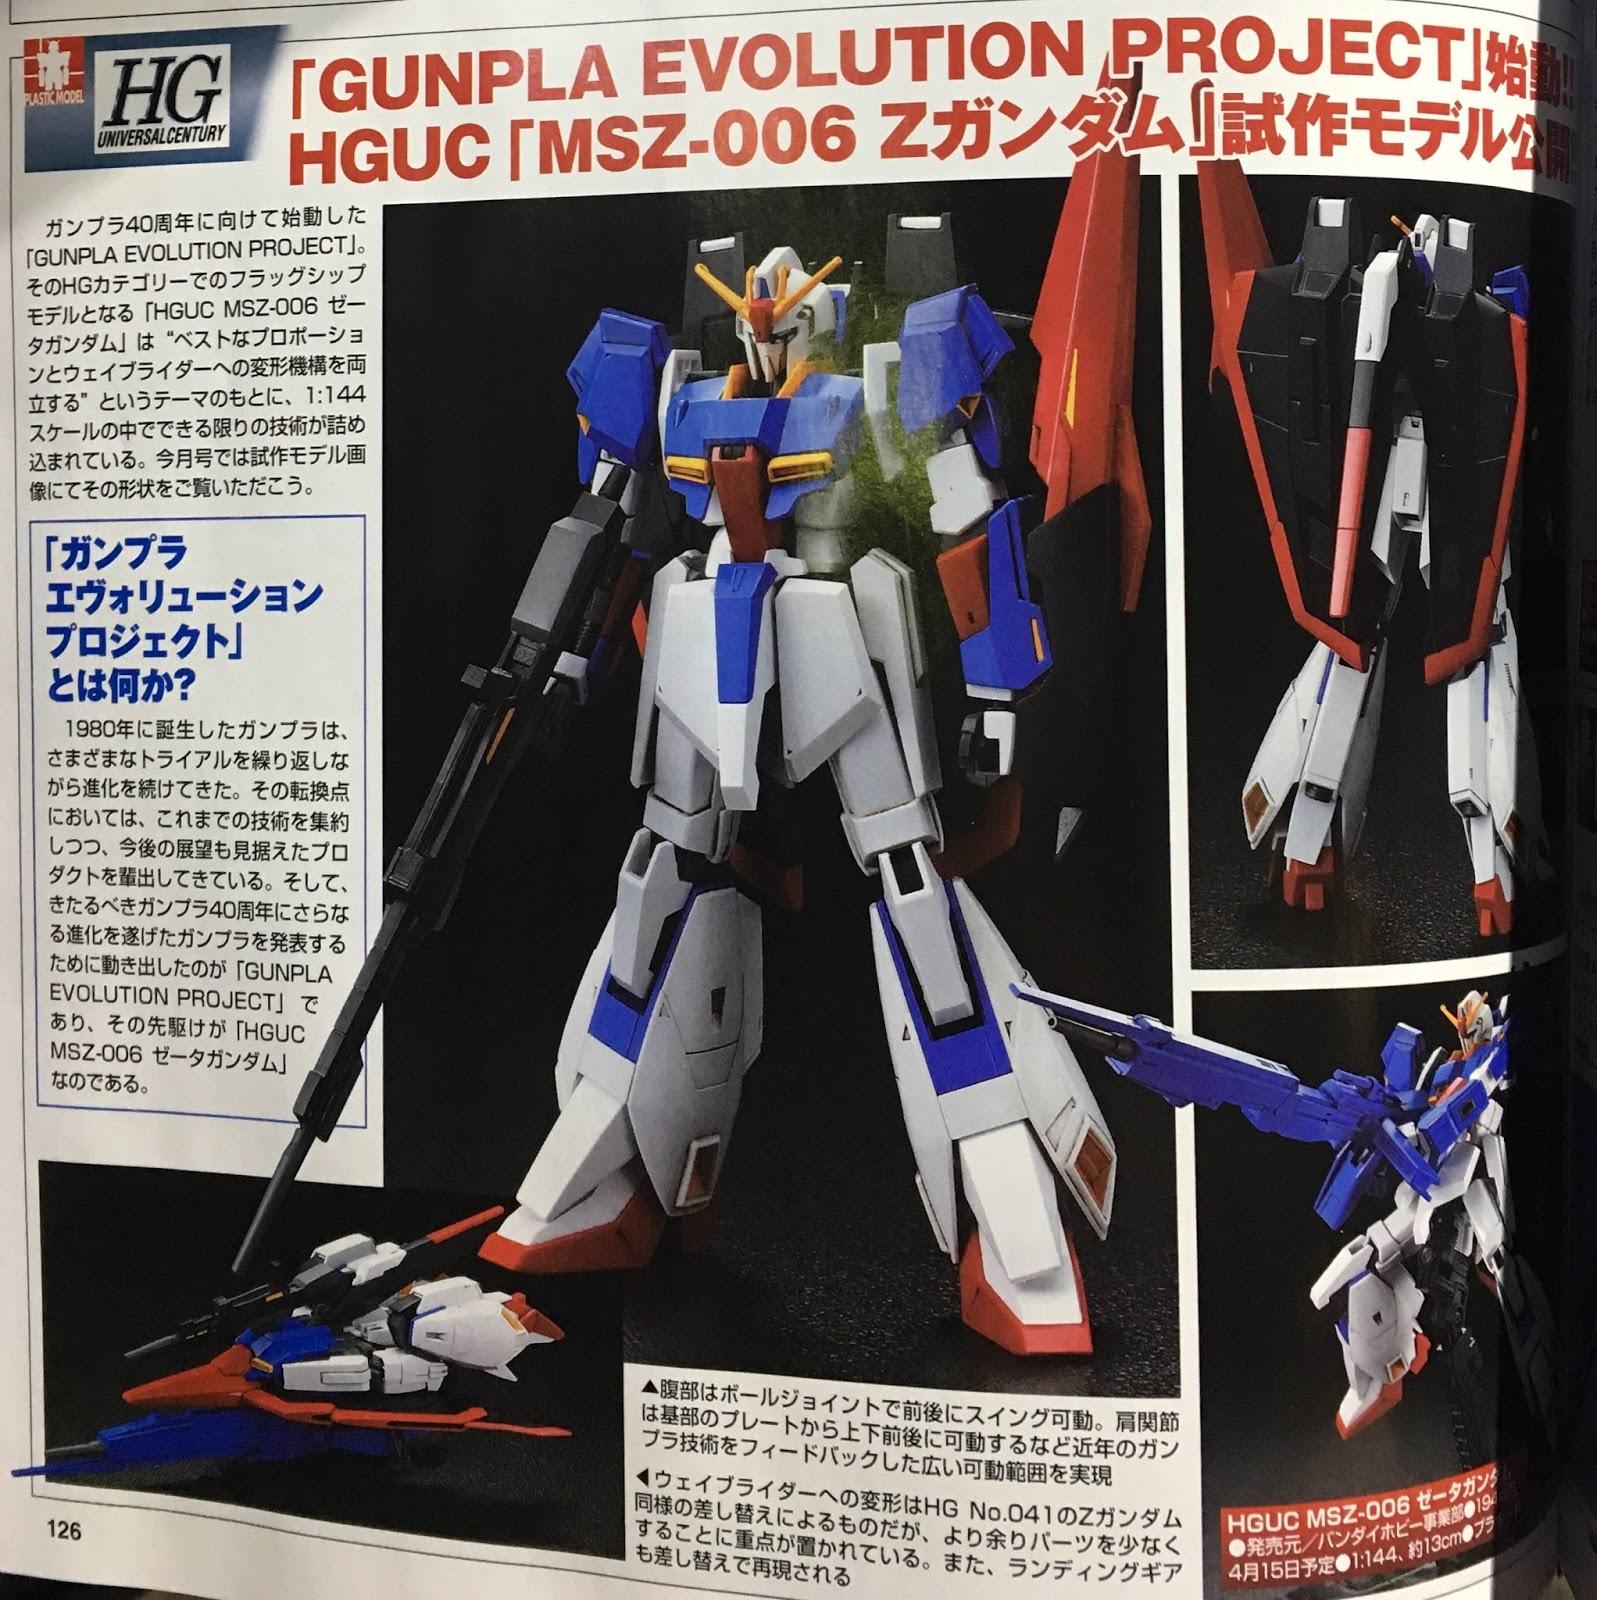 HGUC 1/144 Zeta Gundam [GunPla Evolution Project] - Release Info